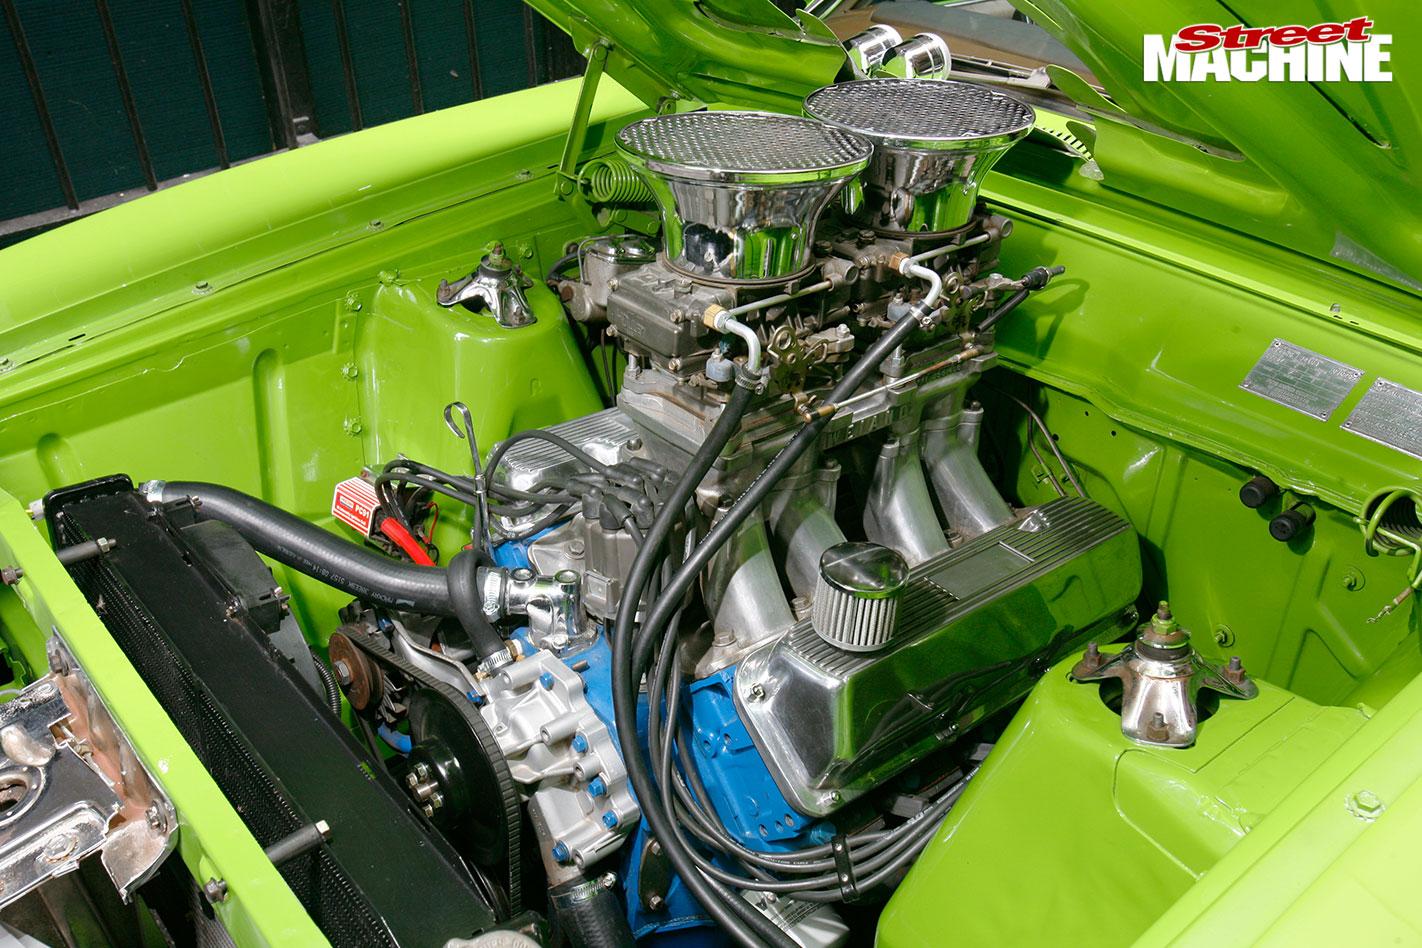 Ford XA wagon engine bay